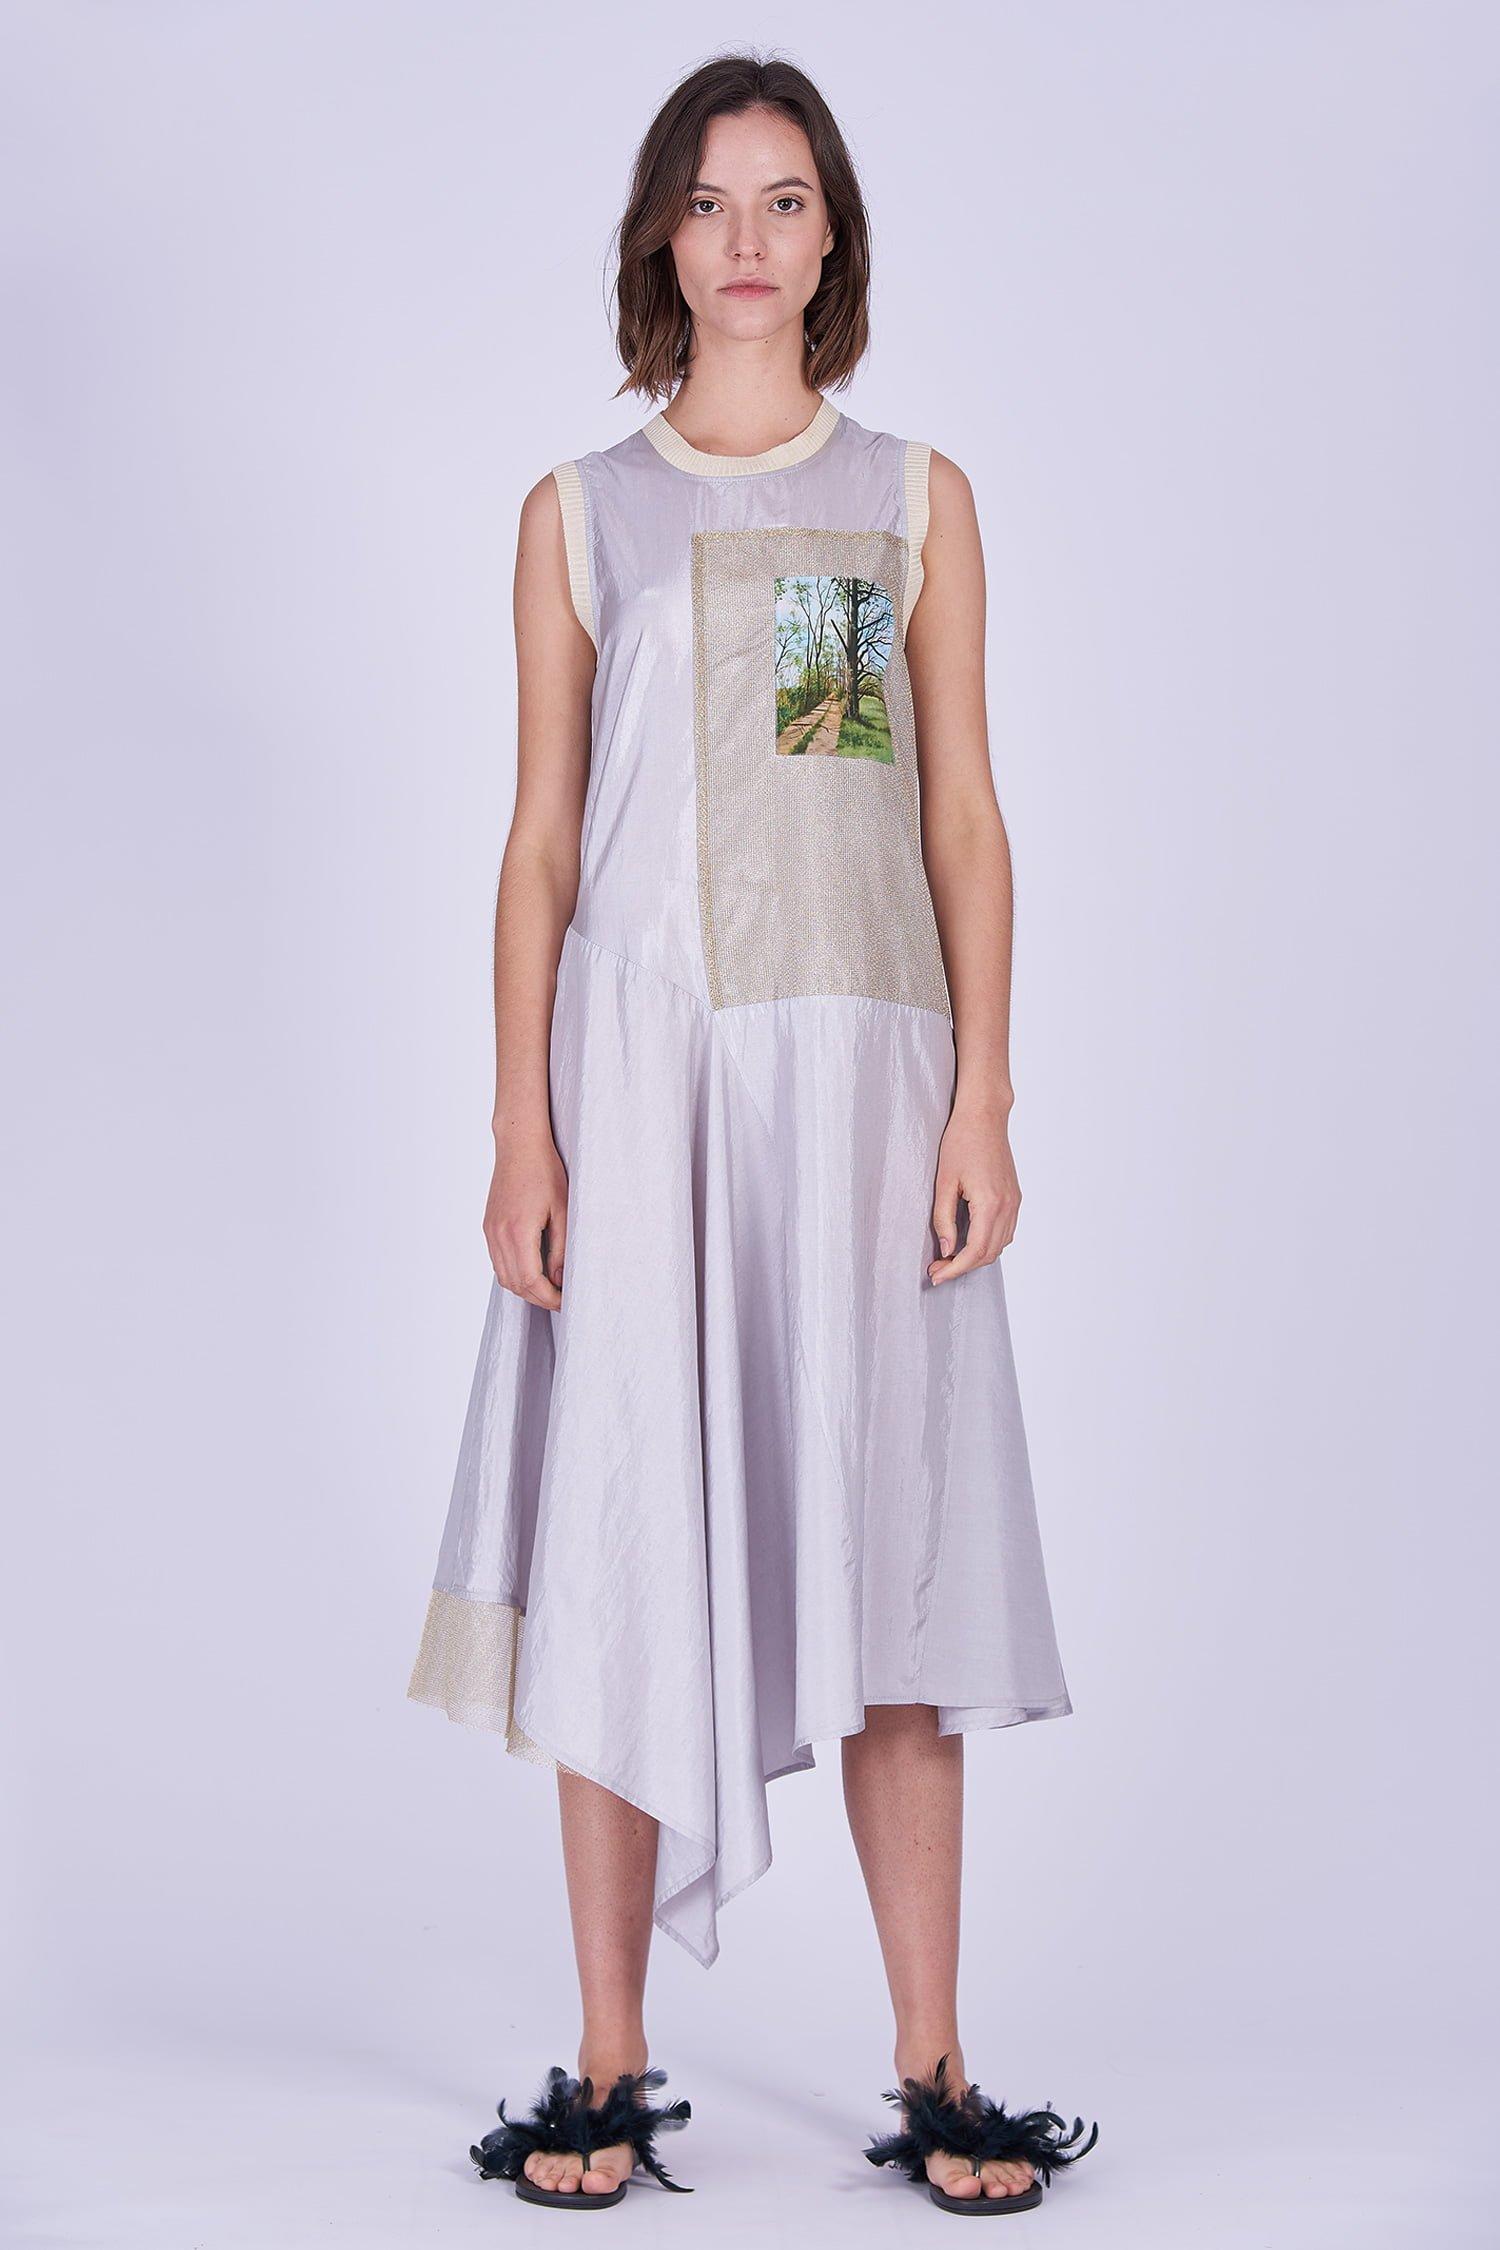 Acephala Ss2020 Sleeveless Asymmetric Silver Summer Dress Letnia Sukienka Front 1